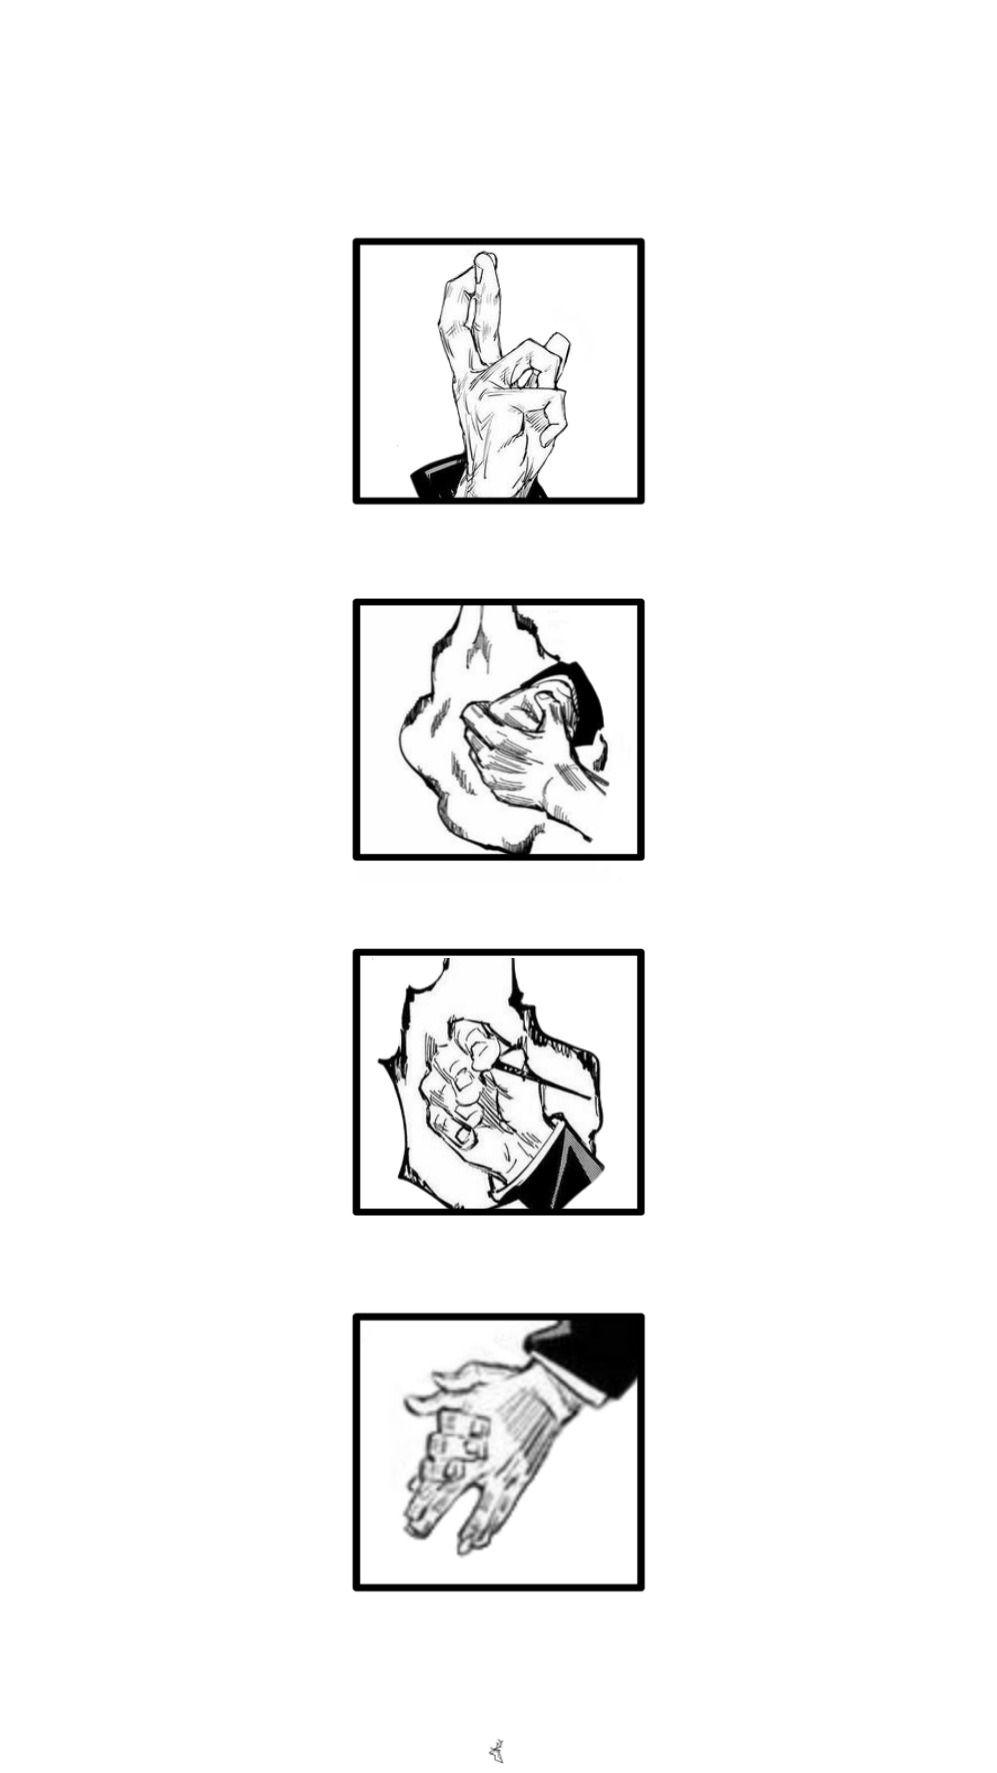 [ ANIME IMPACT ]